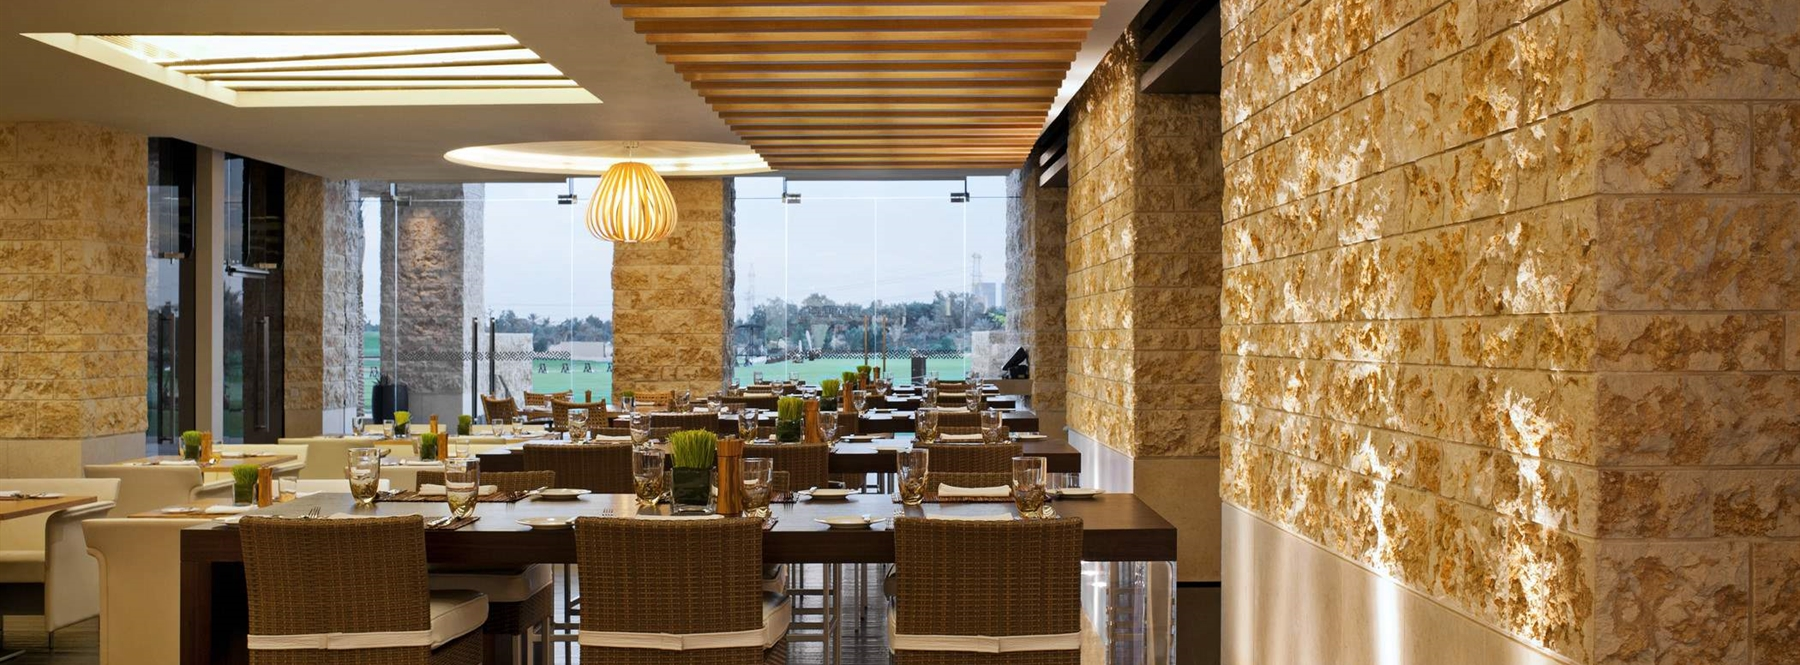 Fairways Restaurant Menu 1